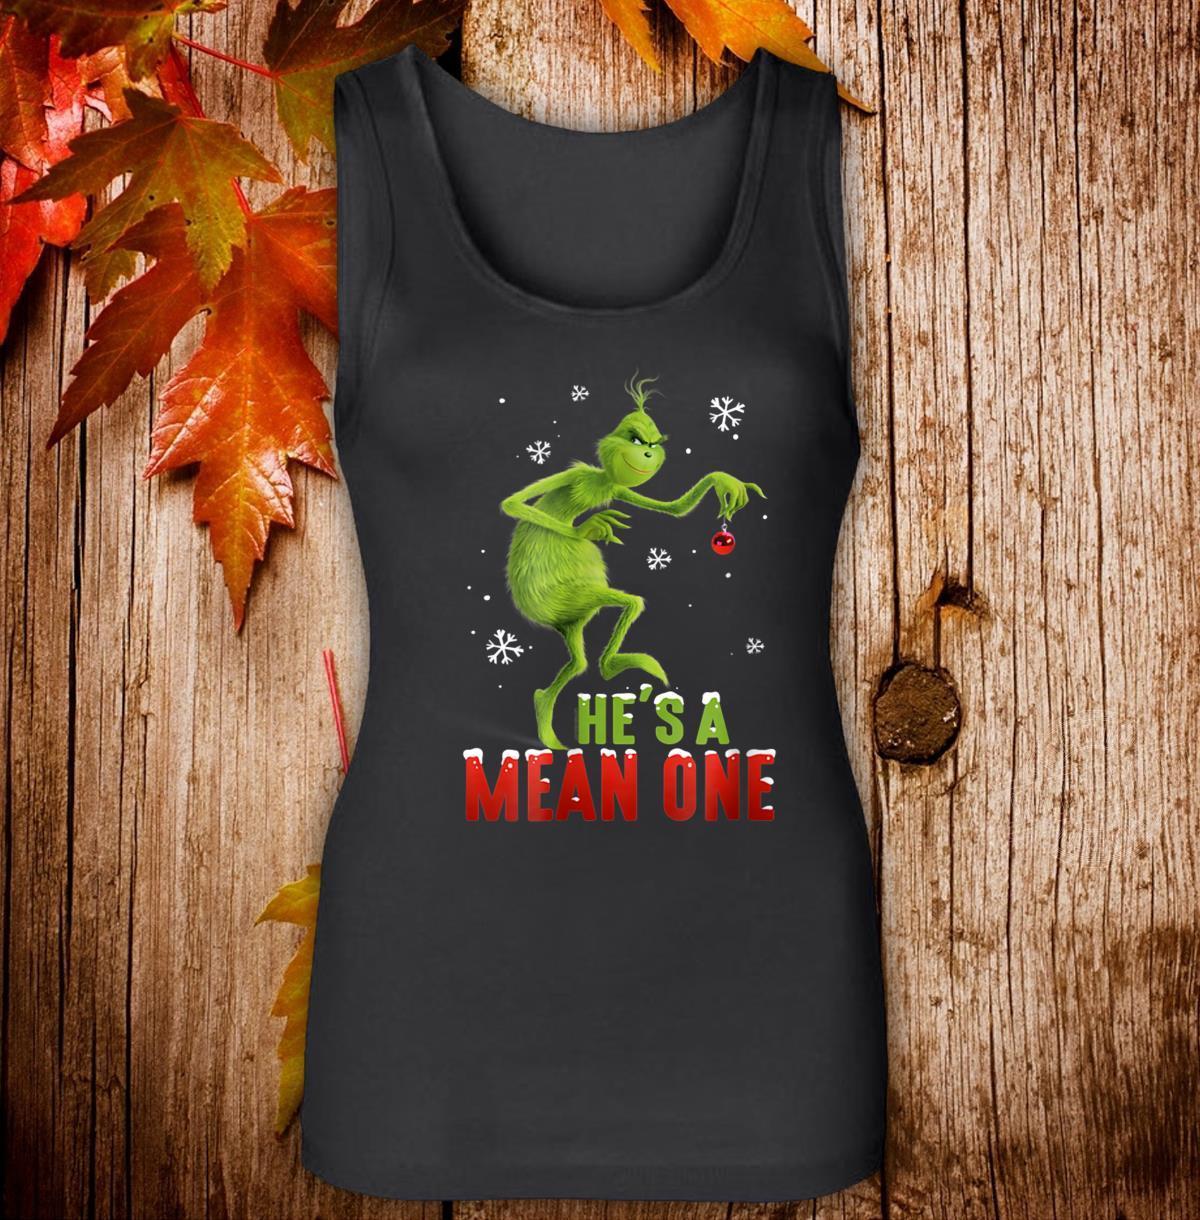 Dr. Seuss The Grinch Mean One Women Jersey Tank Top